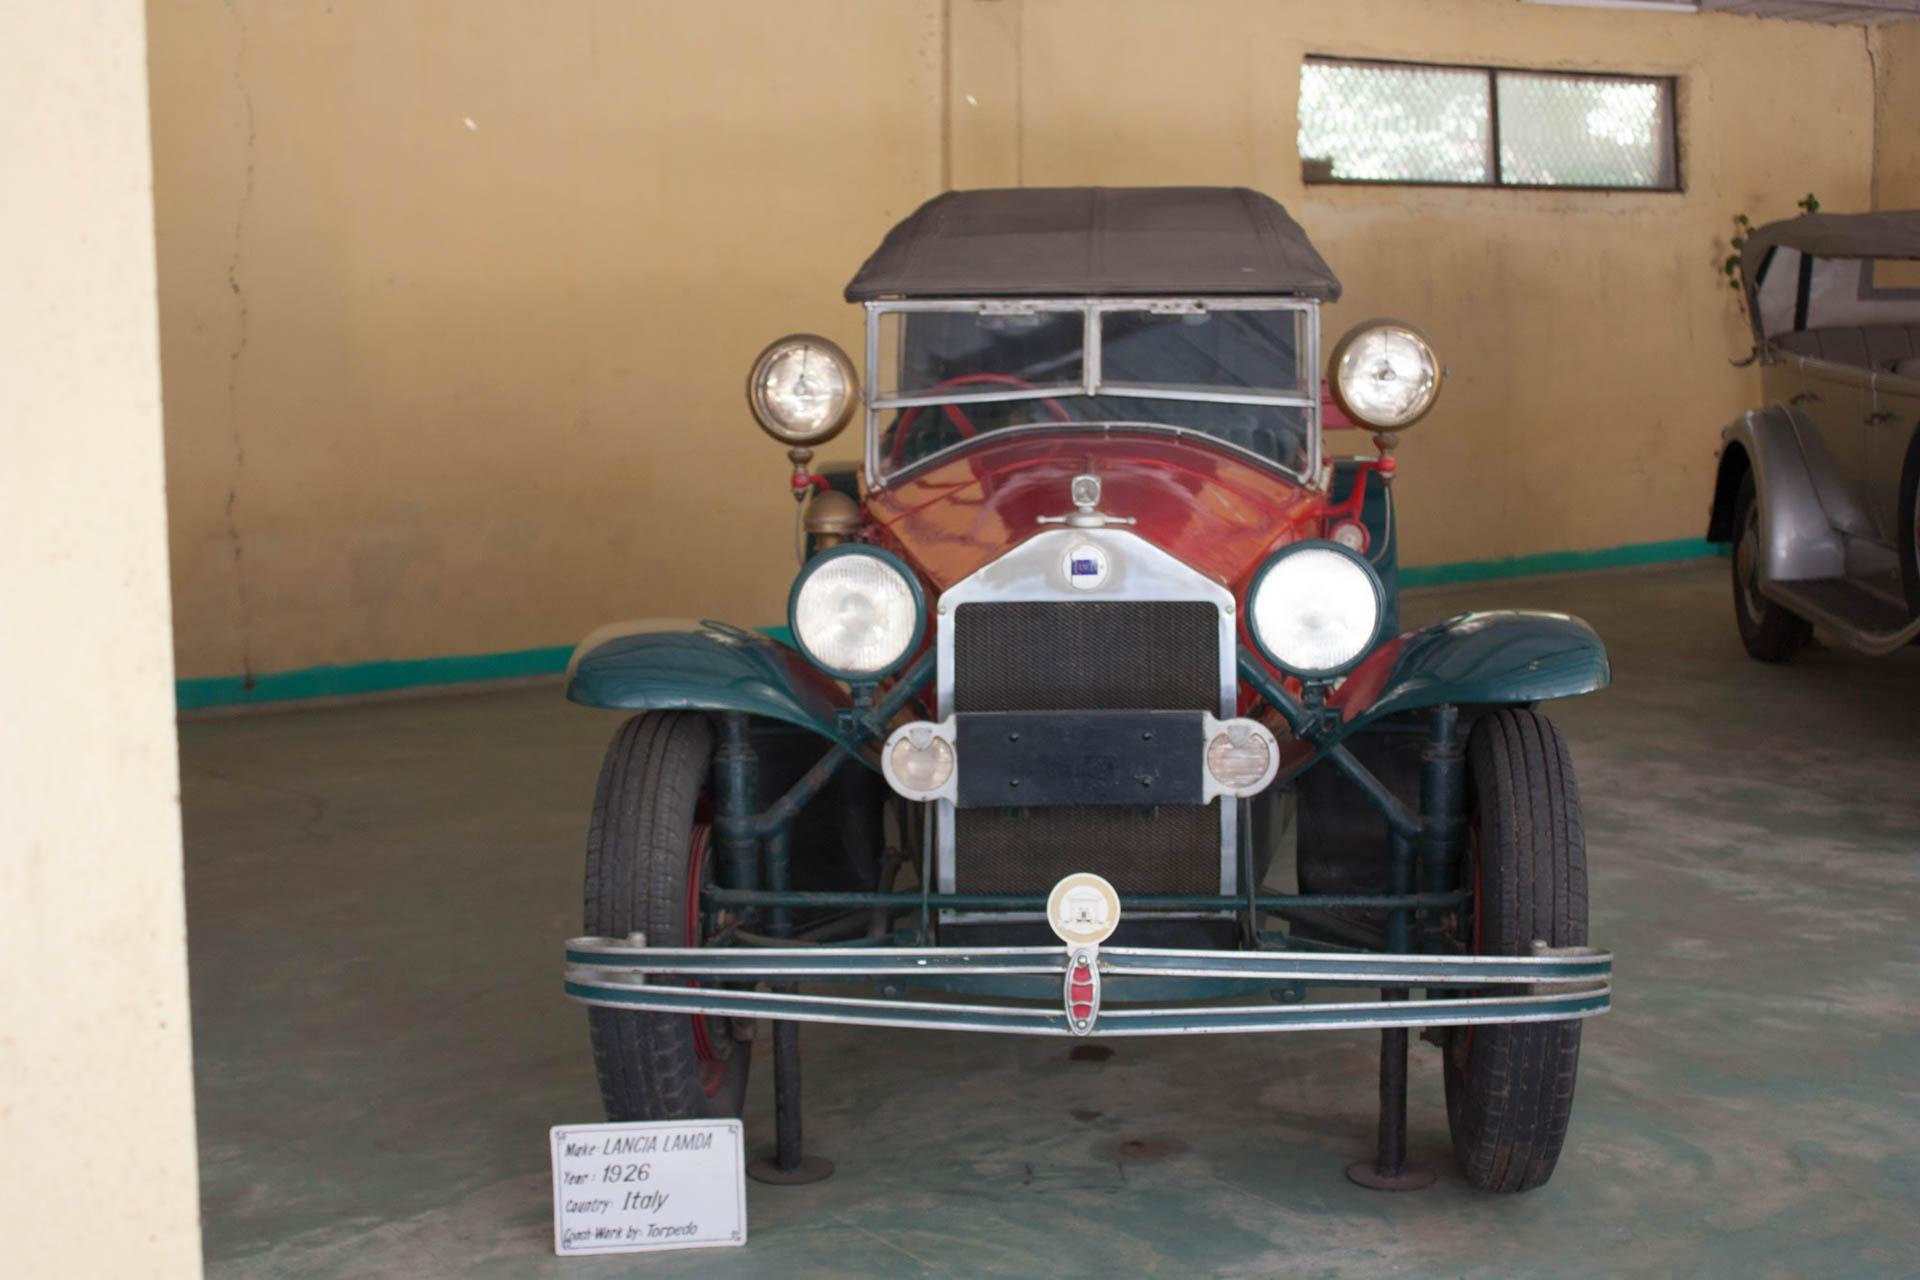 https://upload.wikimedia.org/wikipedia/commons/5/5e/1926_Lancia_Lambda_Torpedo_-_Front.jpg